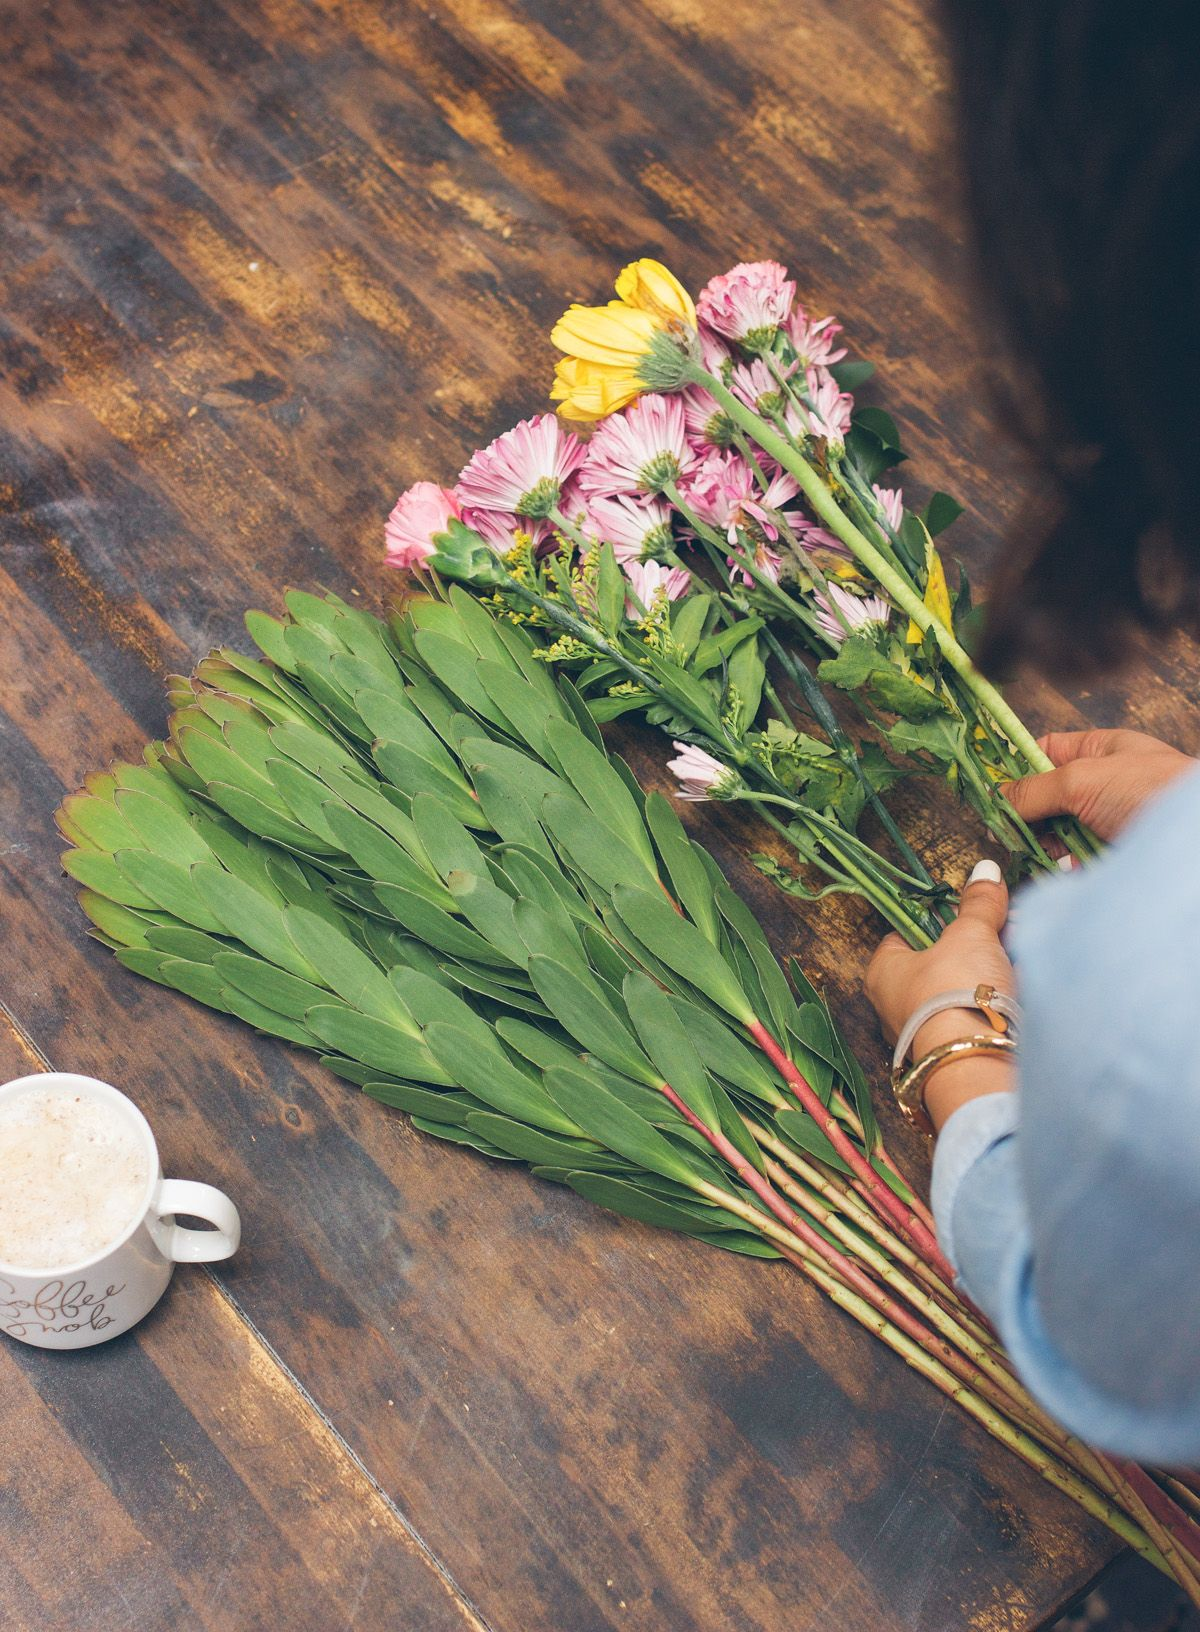 arranging flowers at home, easy flower arrangement